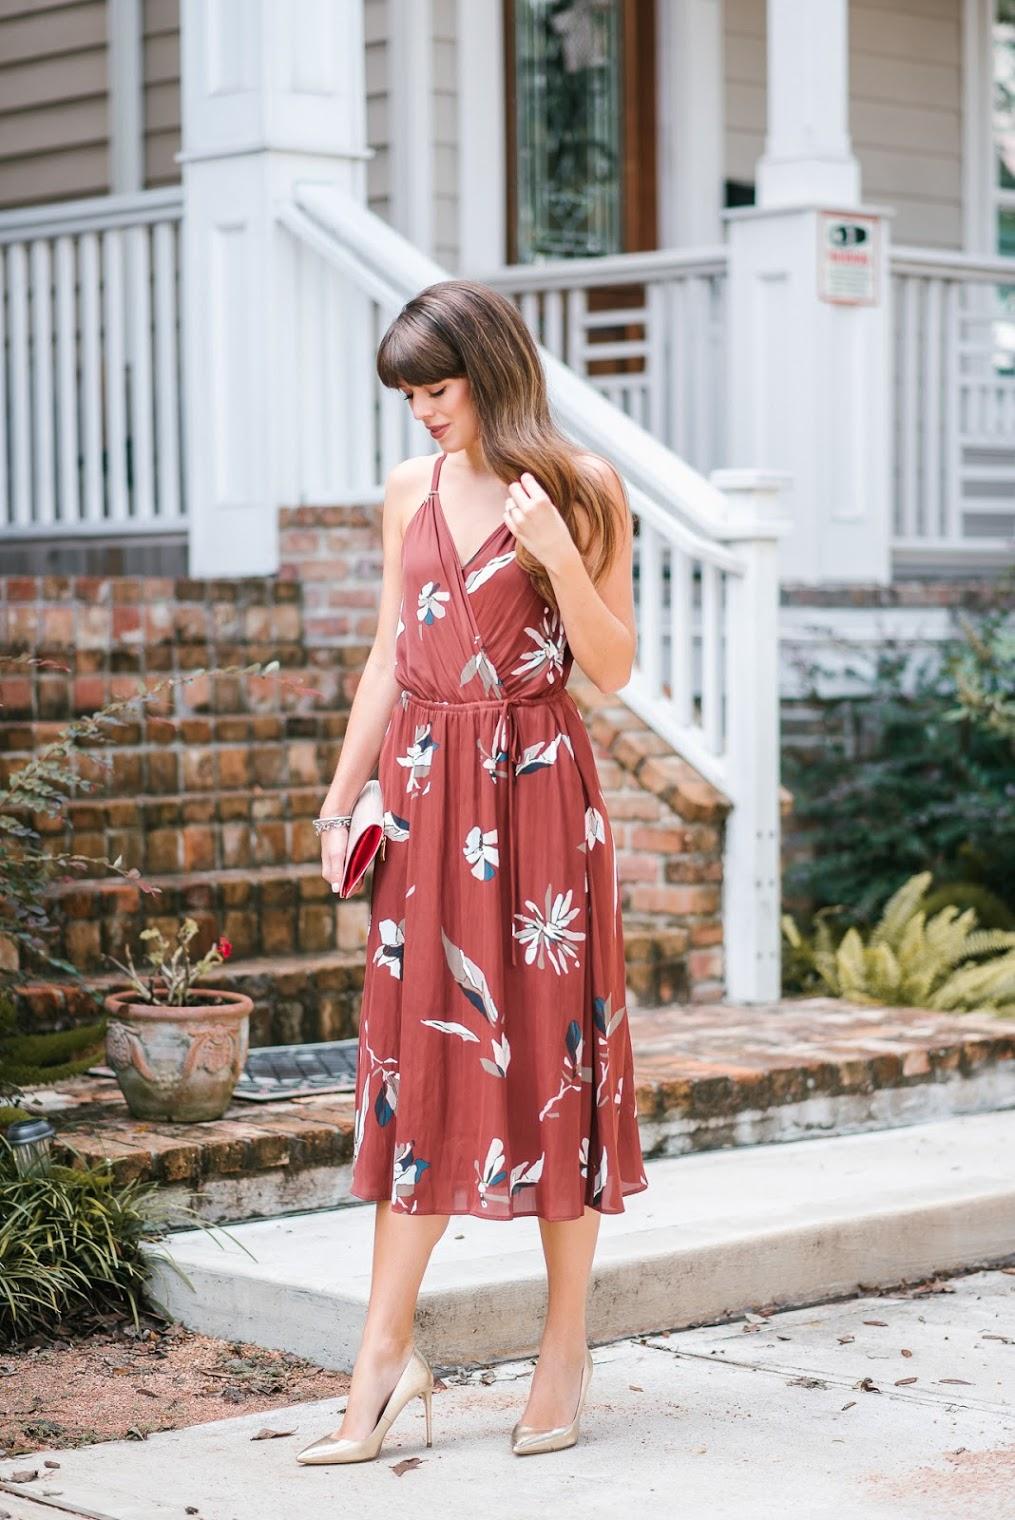 Fall Wedding Guest Dress - Tayler Malott